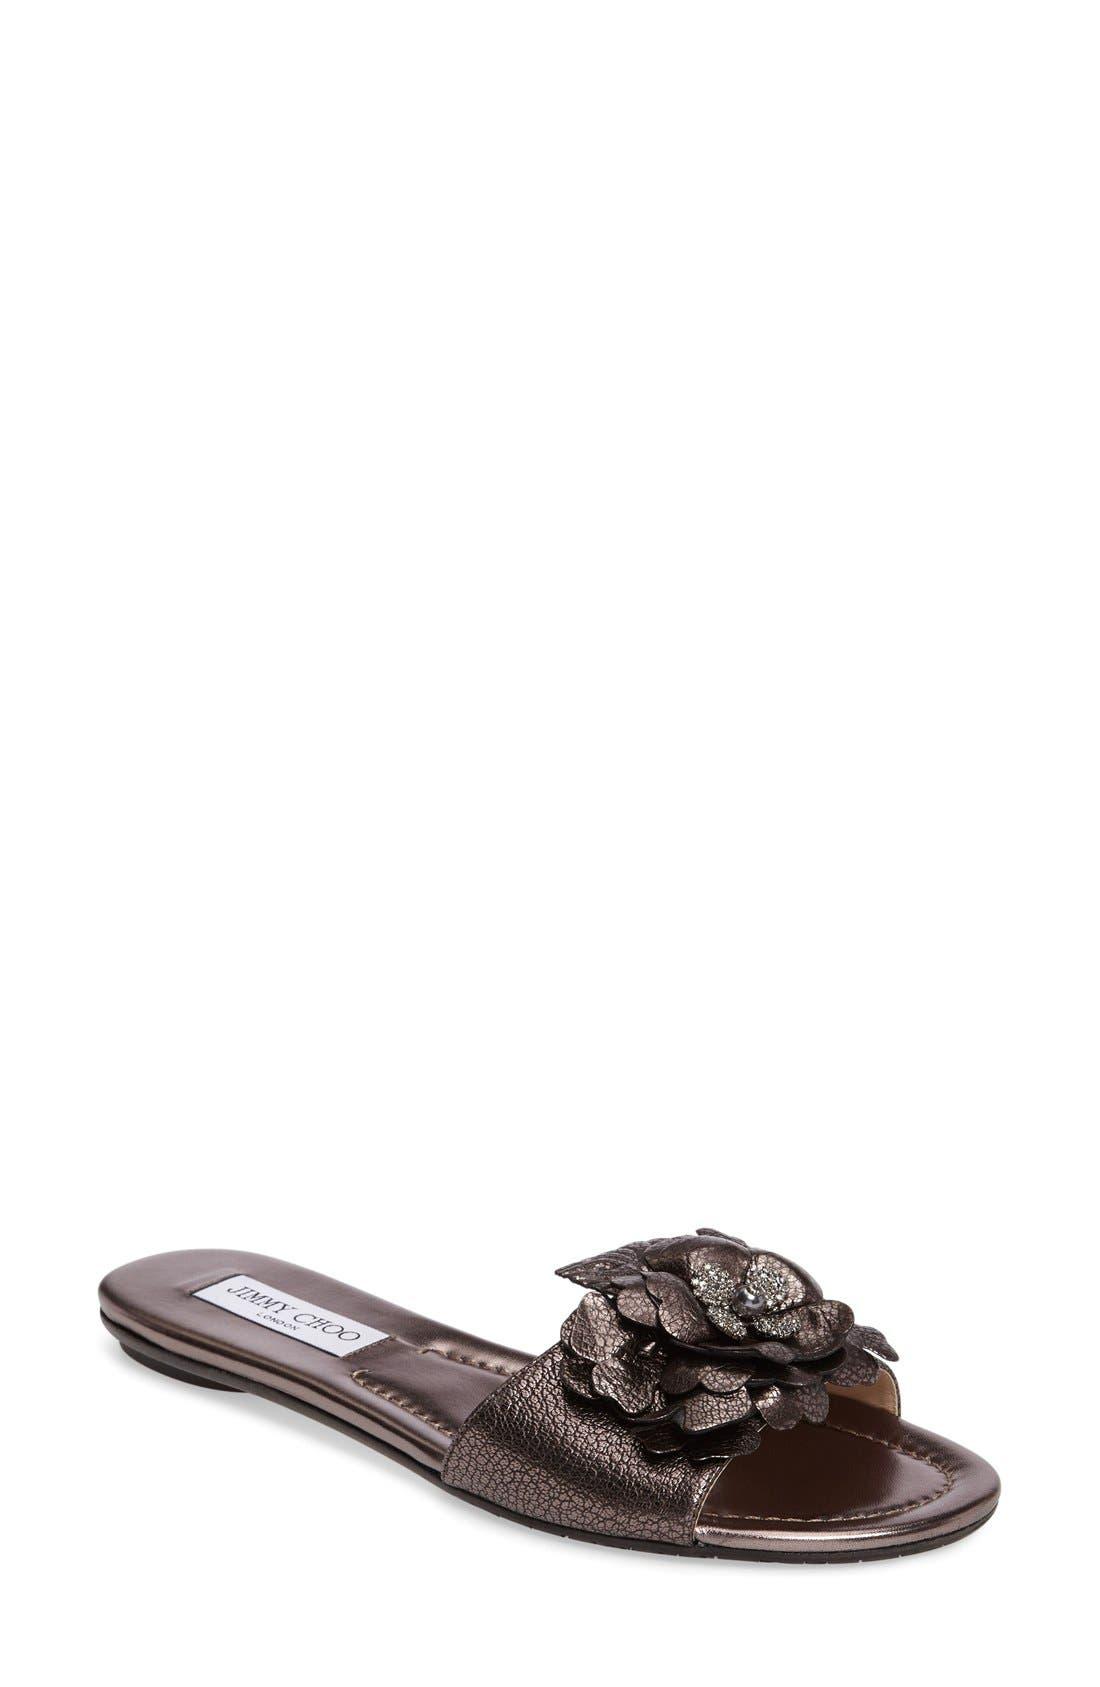 JIMMY CHOO Neave Embellished Slide Sandal